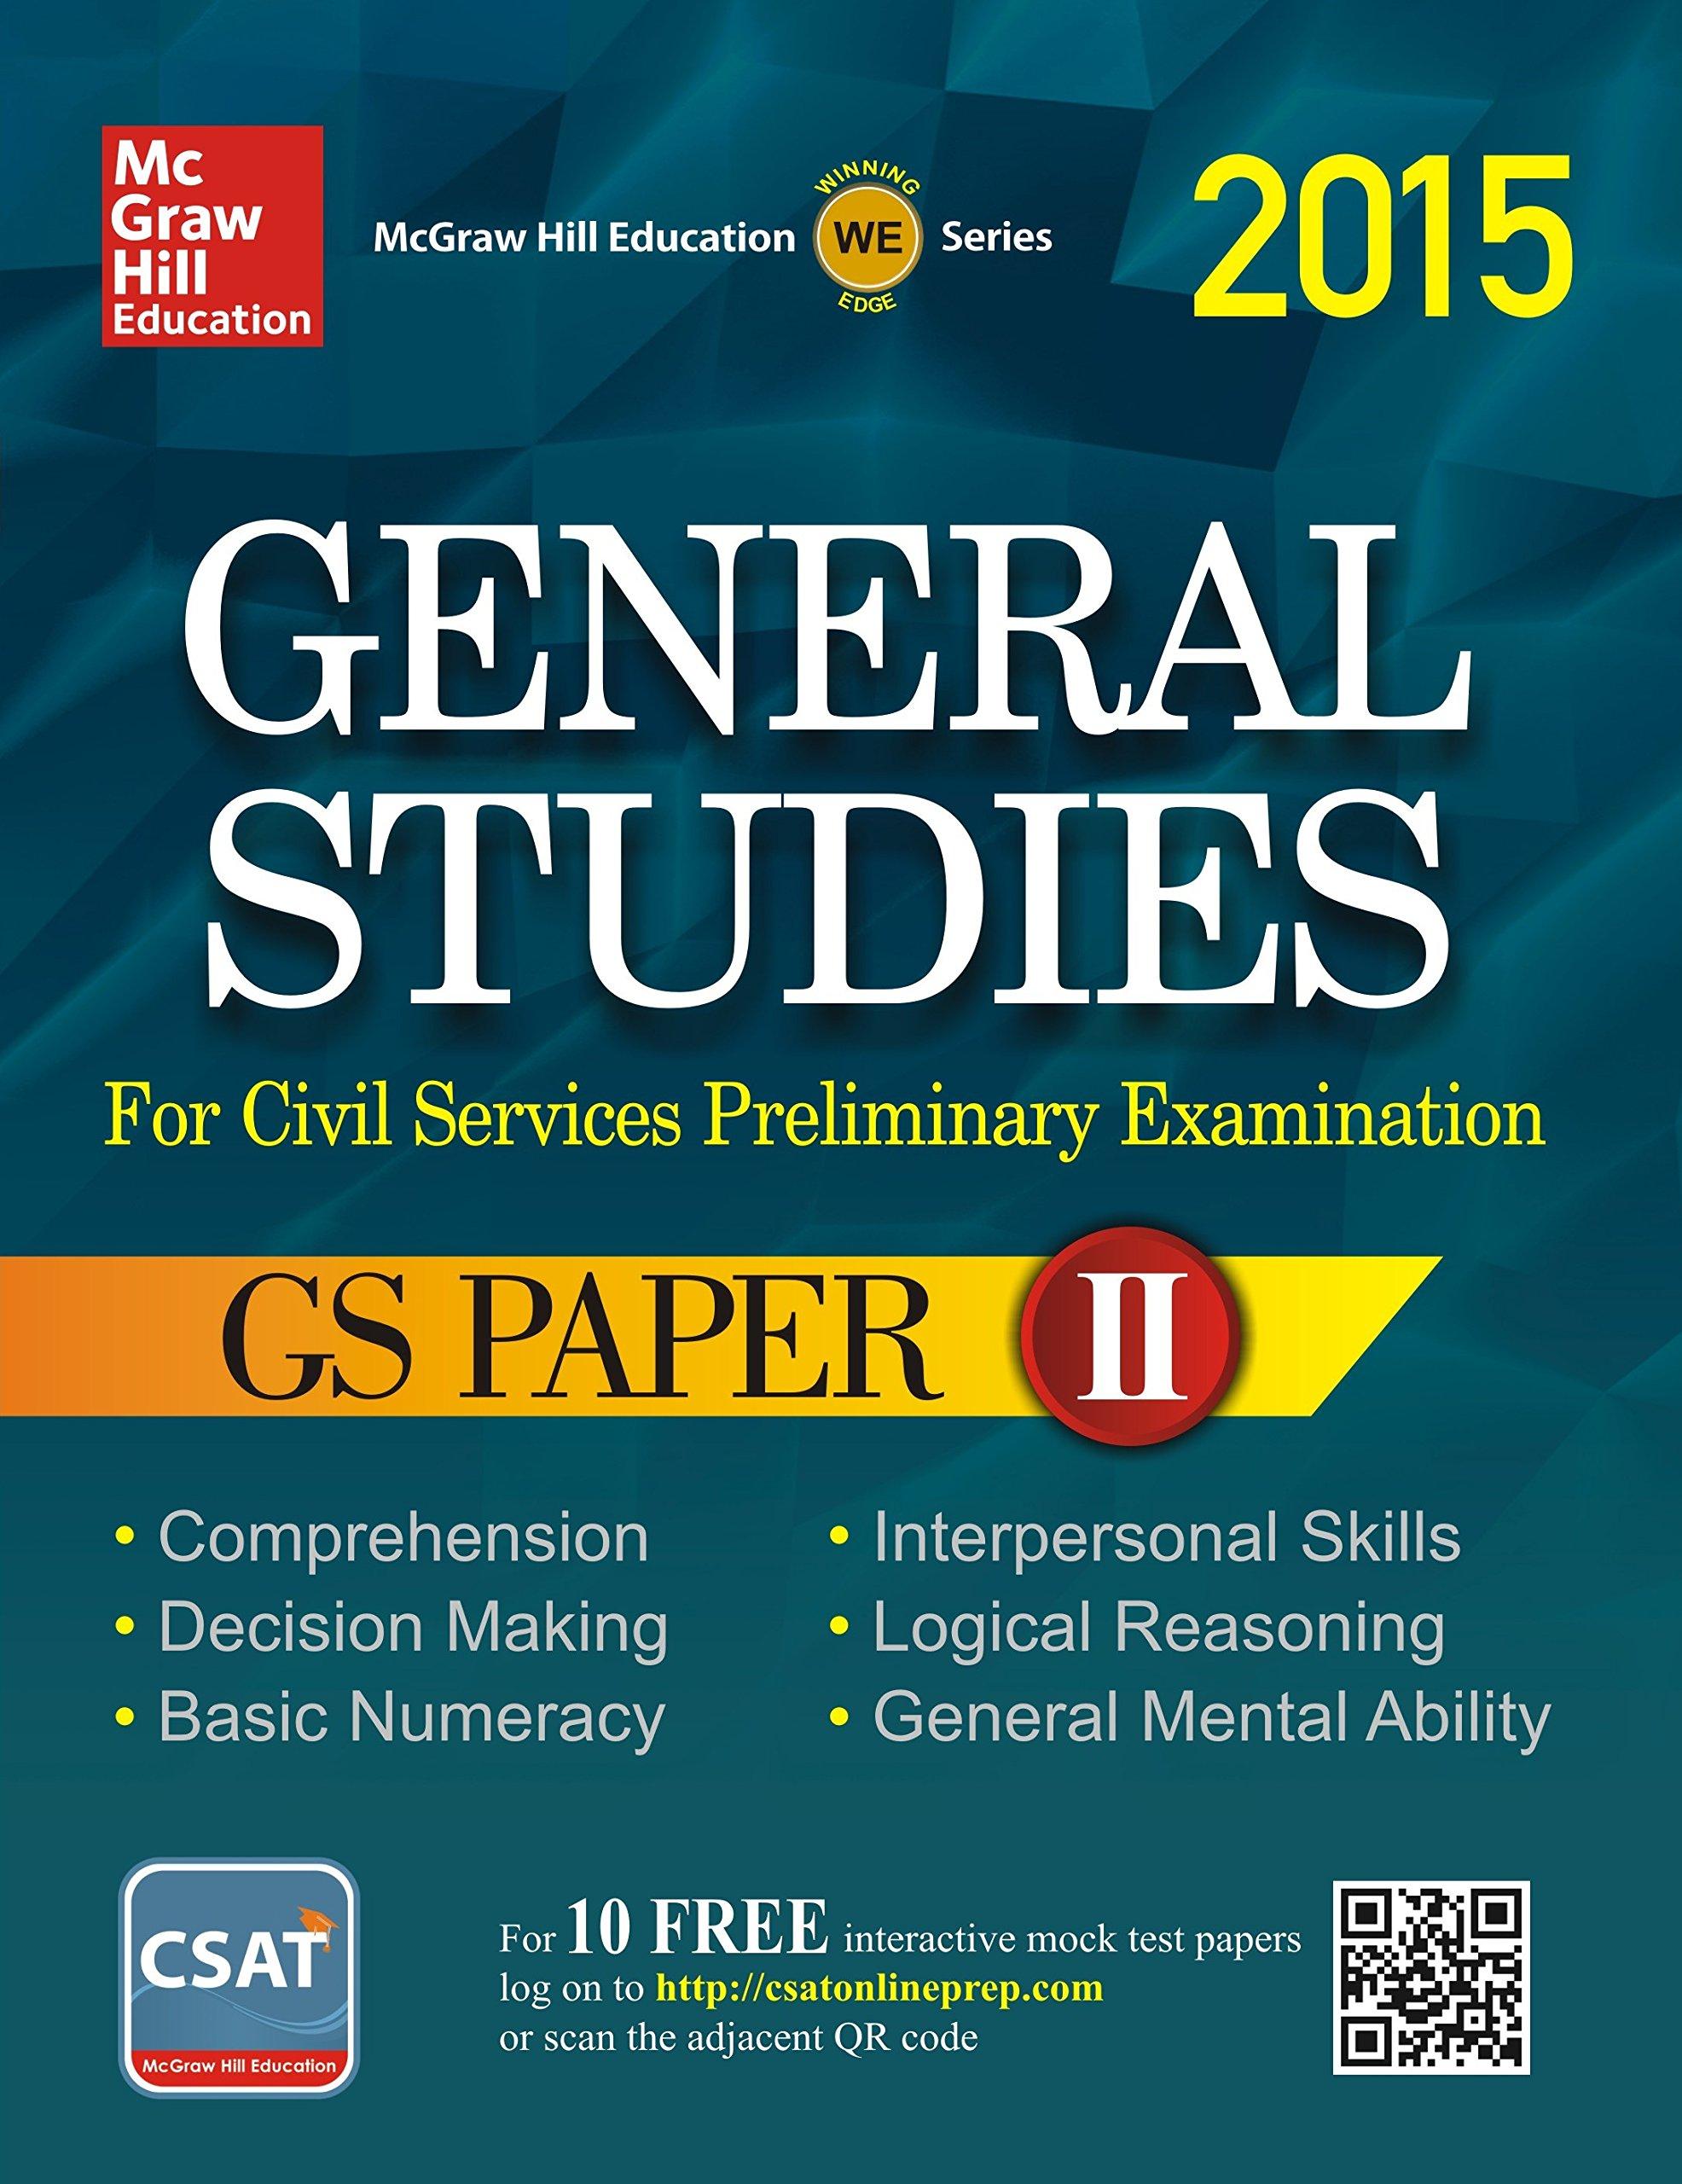 Buy General Studies - Paper 2 (2015) Book Online at Low Prices in India | General  Studies - Paper 2 (2015) Reviews & Ratings - Amazon.in